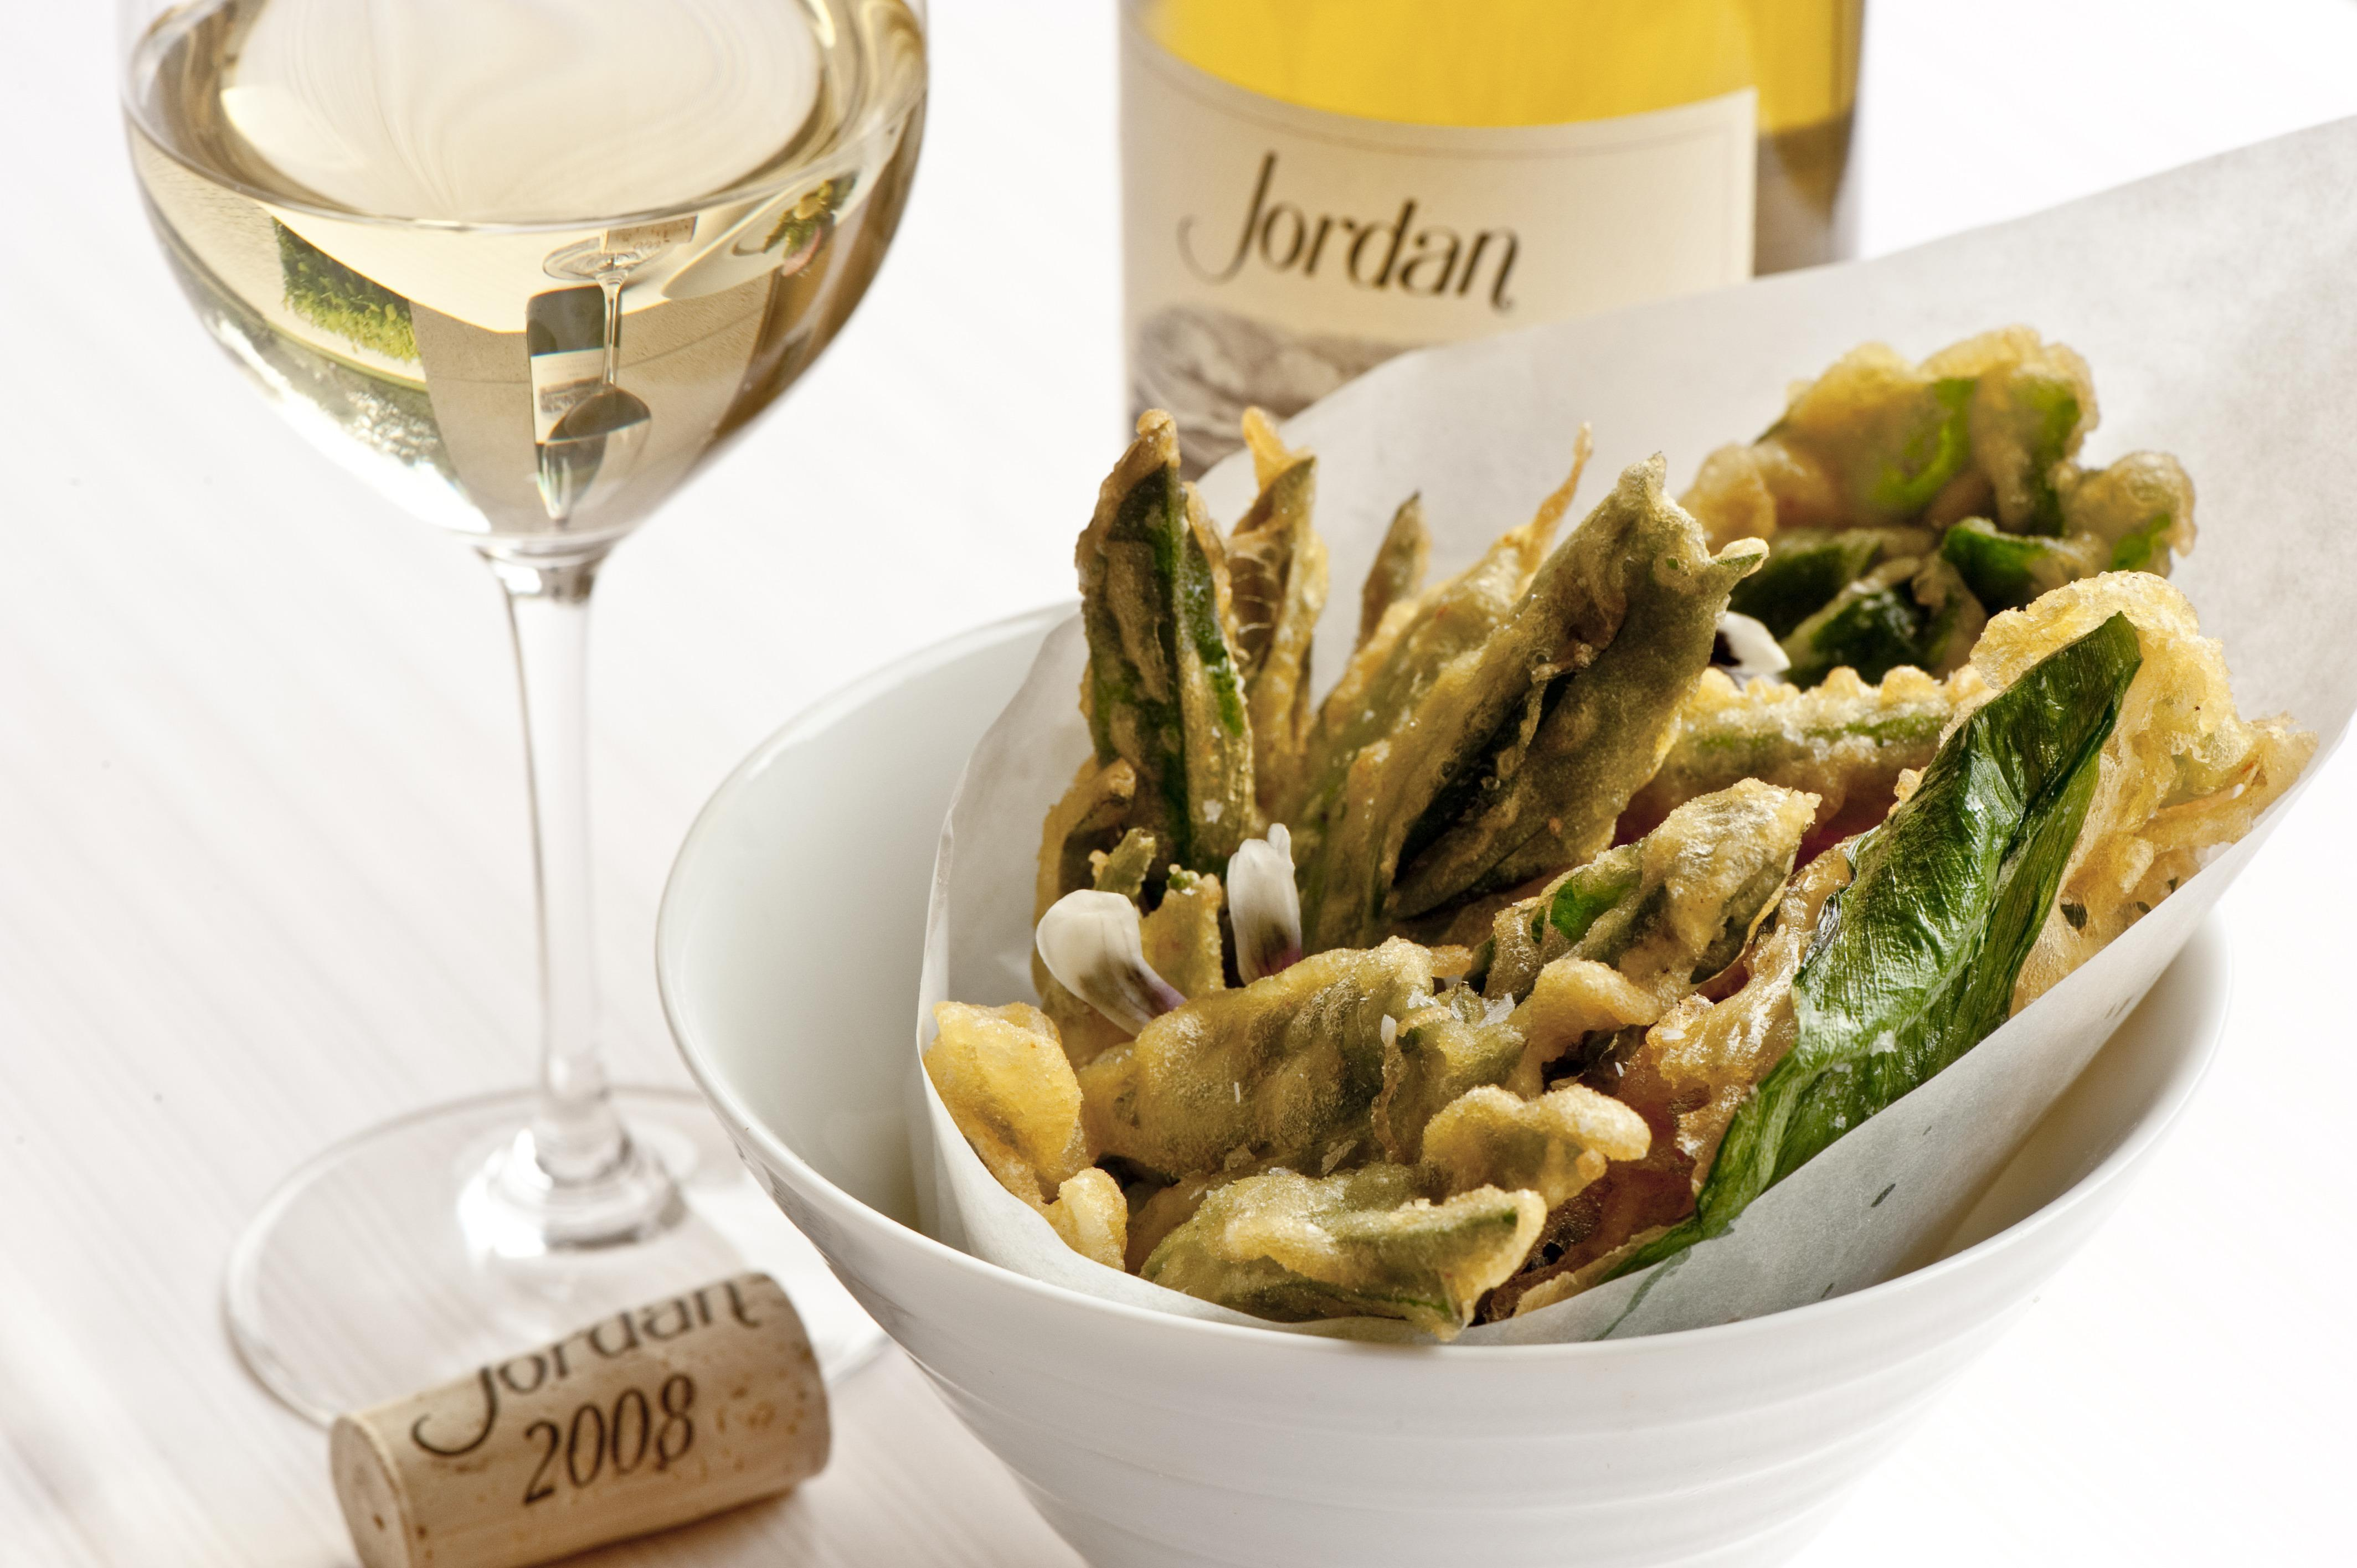 Vegetable tempura recipe and Jordan Chardonnay